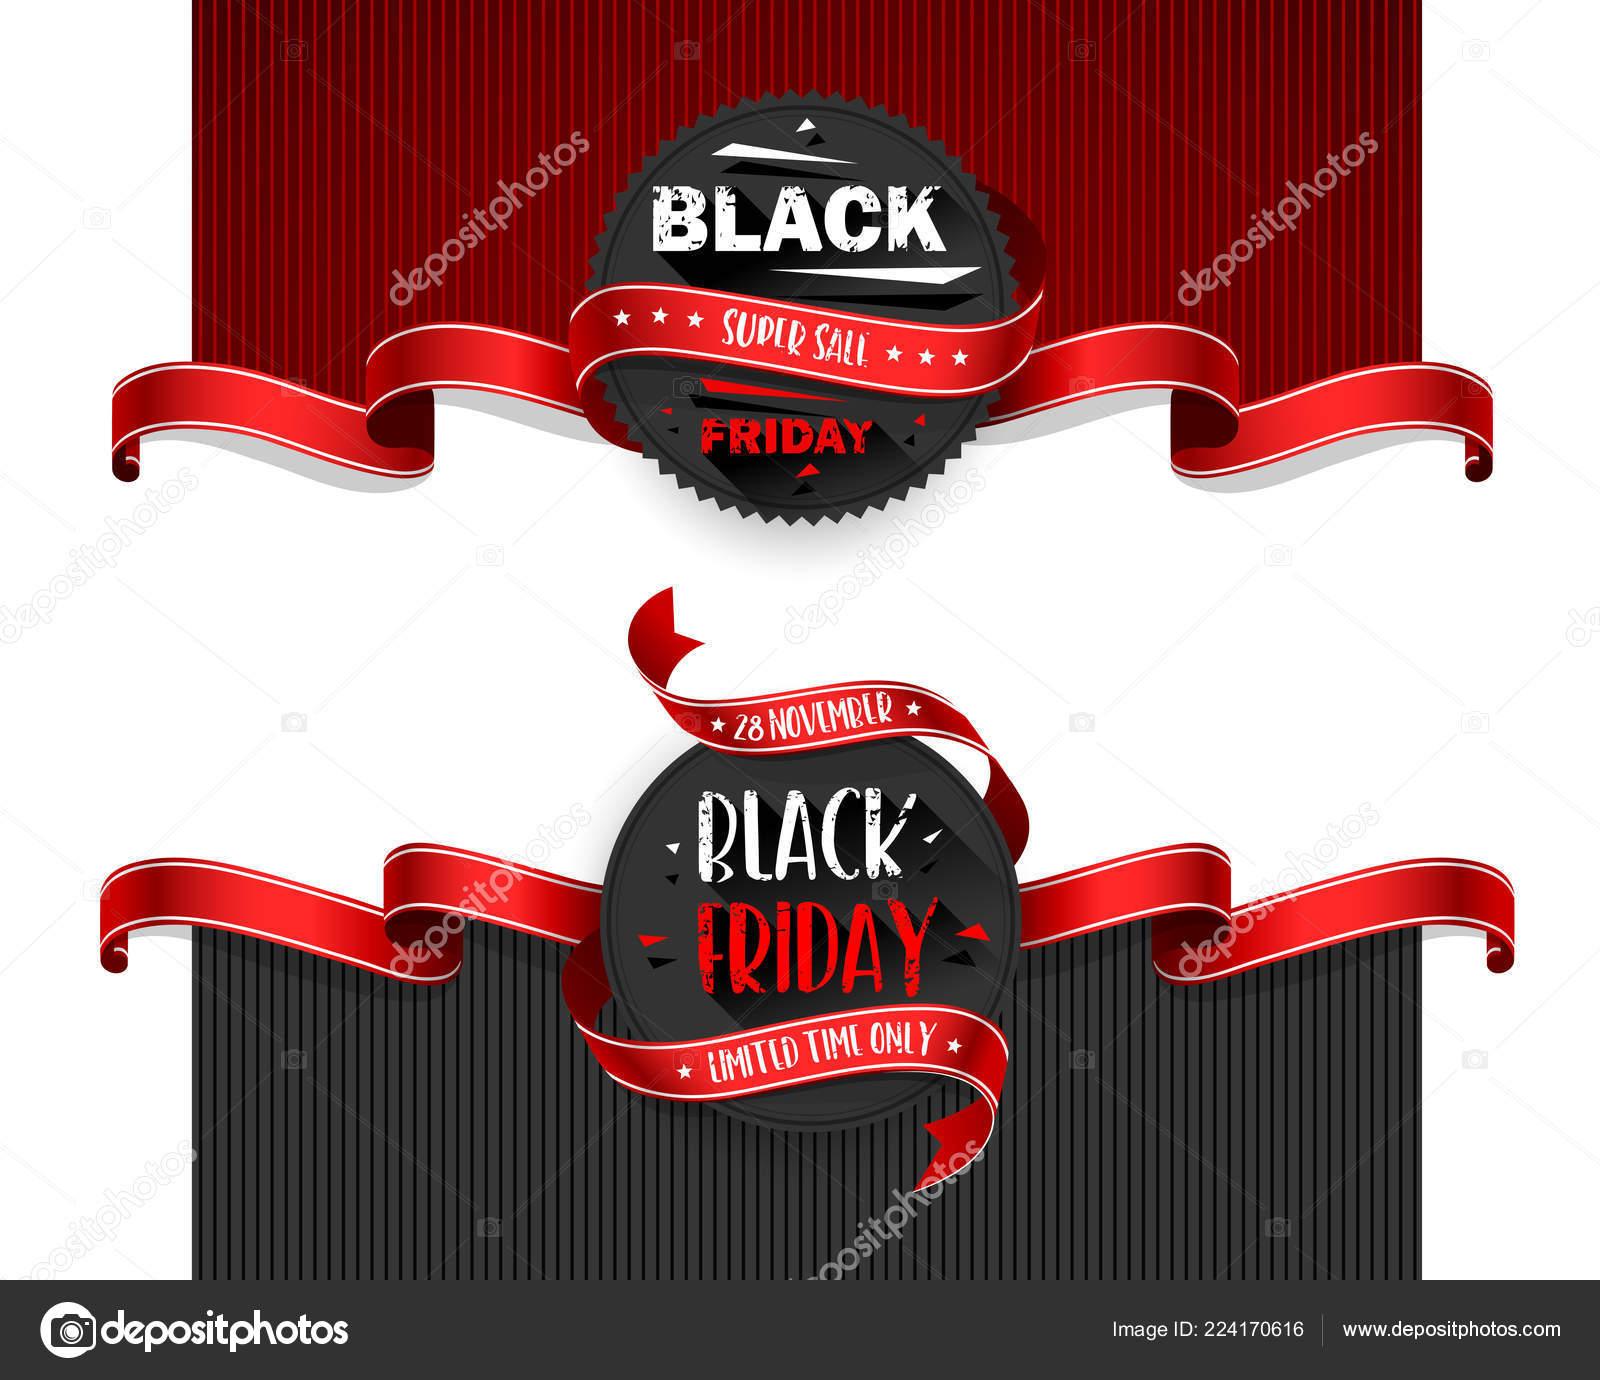 Black Friday Sale Flyers Set For Business Vector Illustration Stock Vector C Baks 224170616